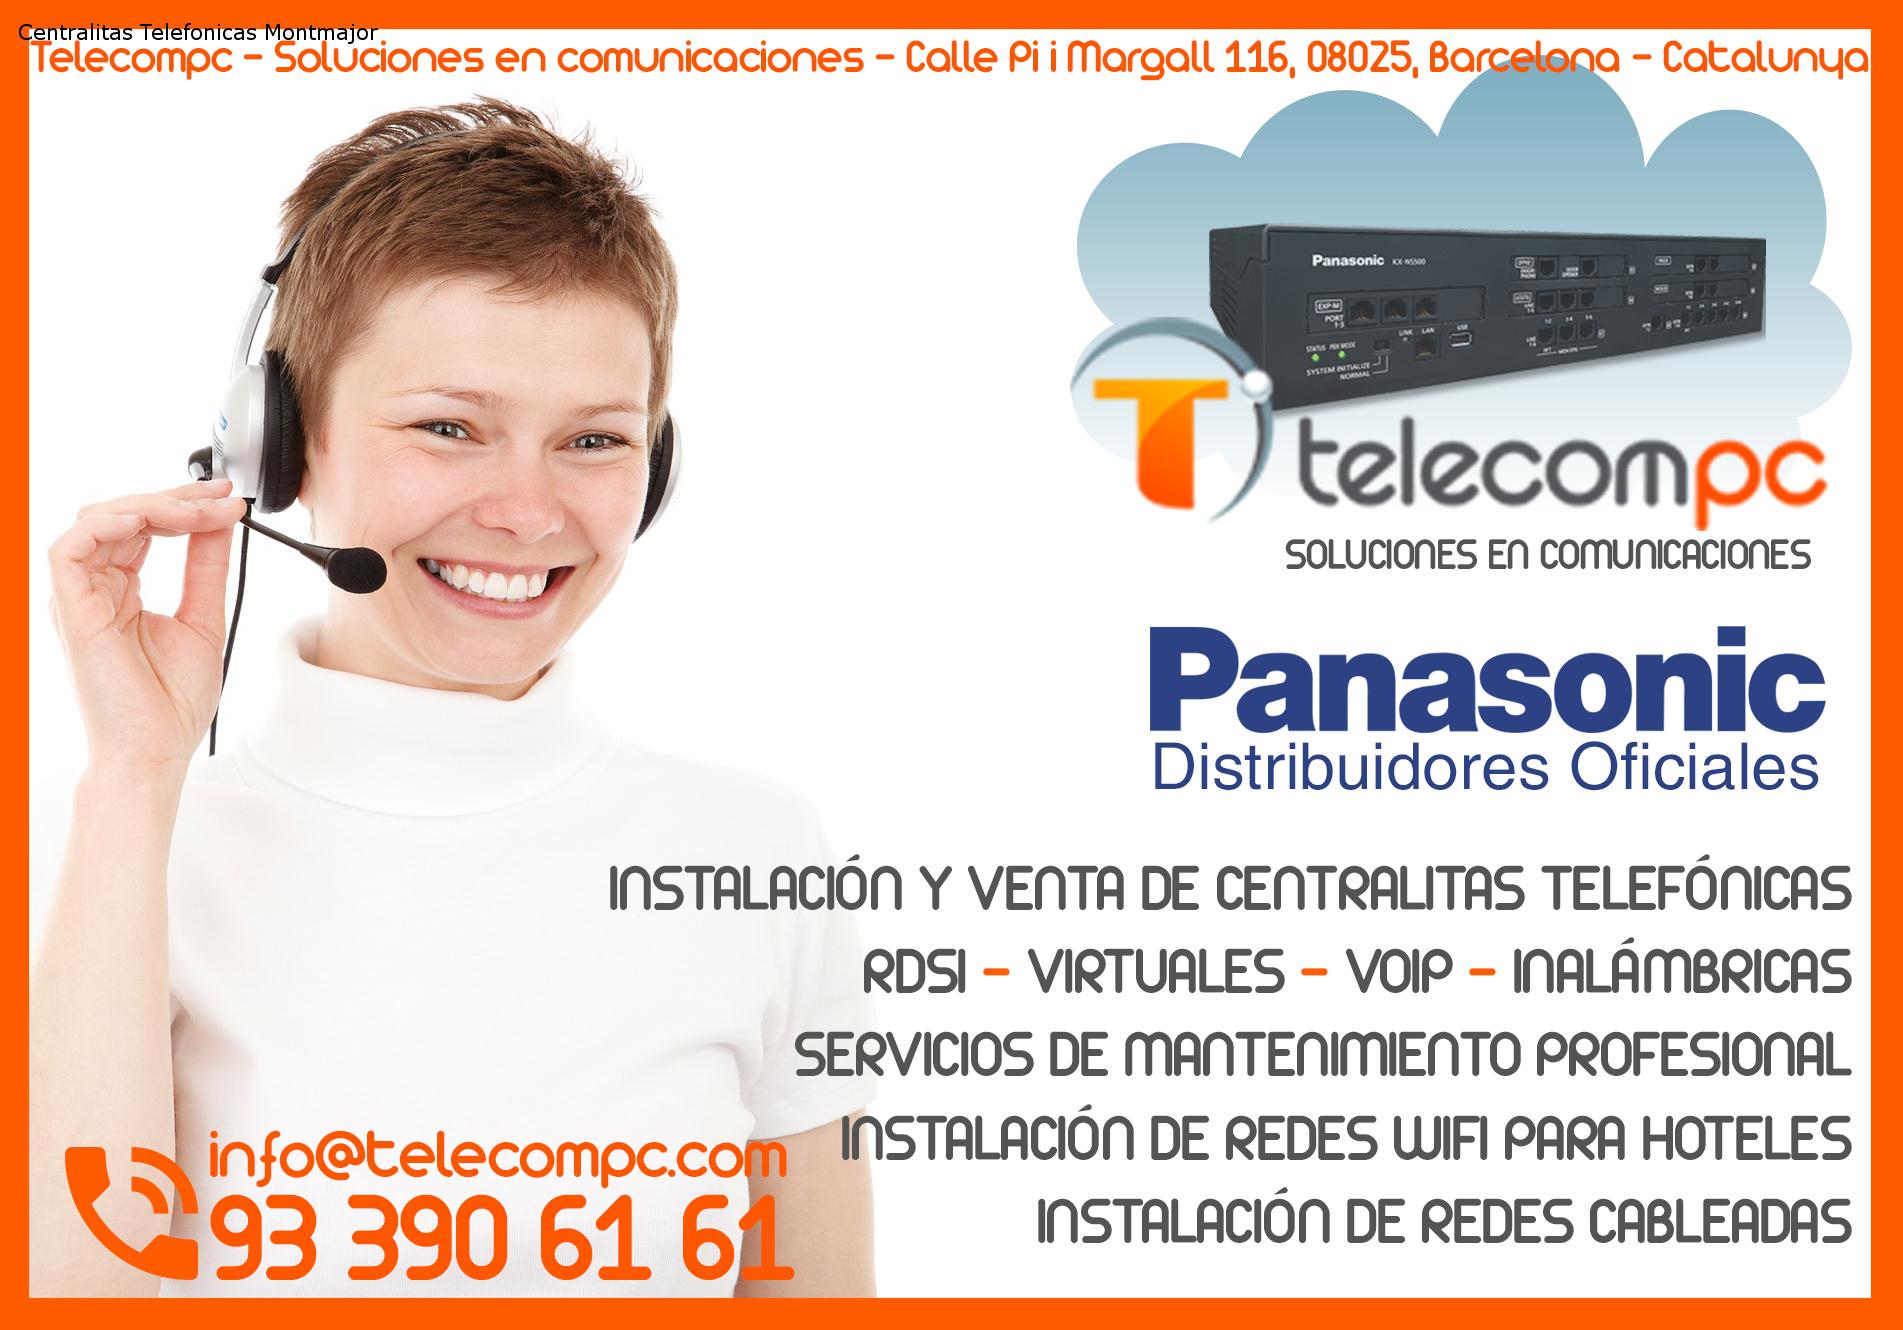 Centralitas Telefonicas Montmajor